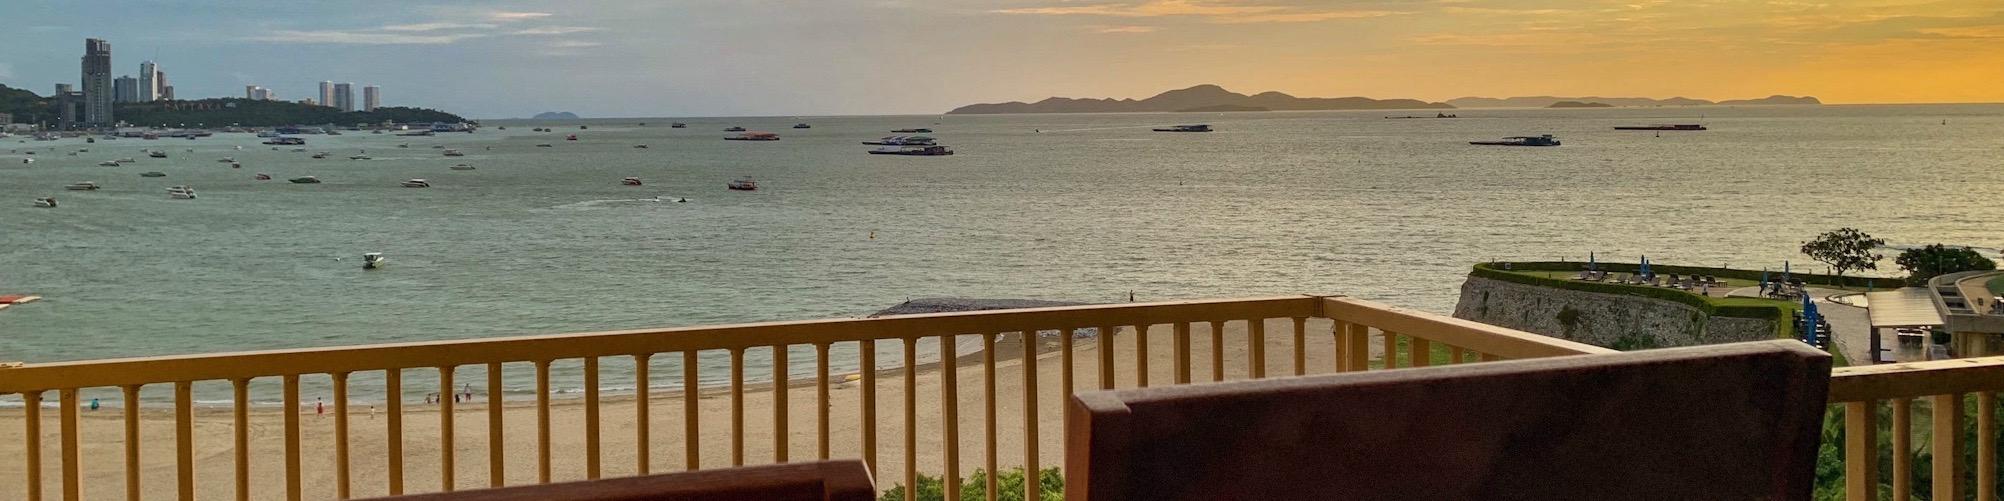 Pattaya_headder02 – 1